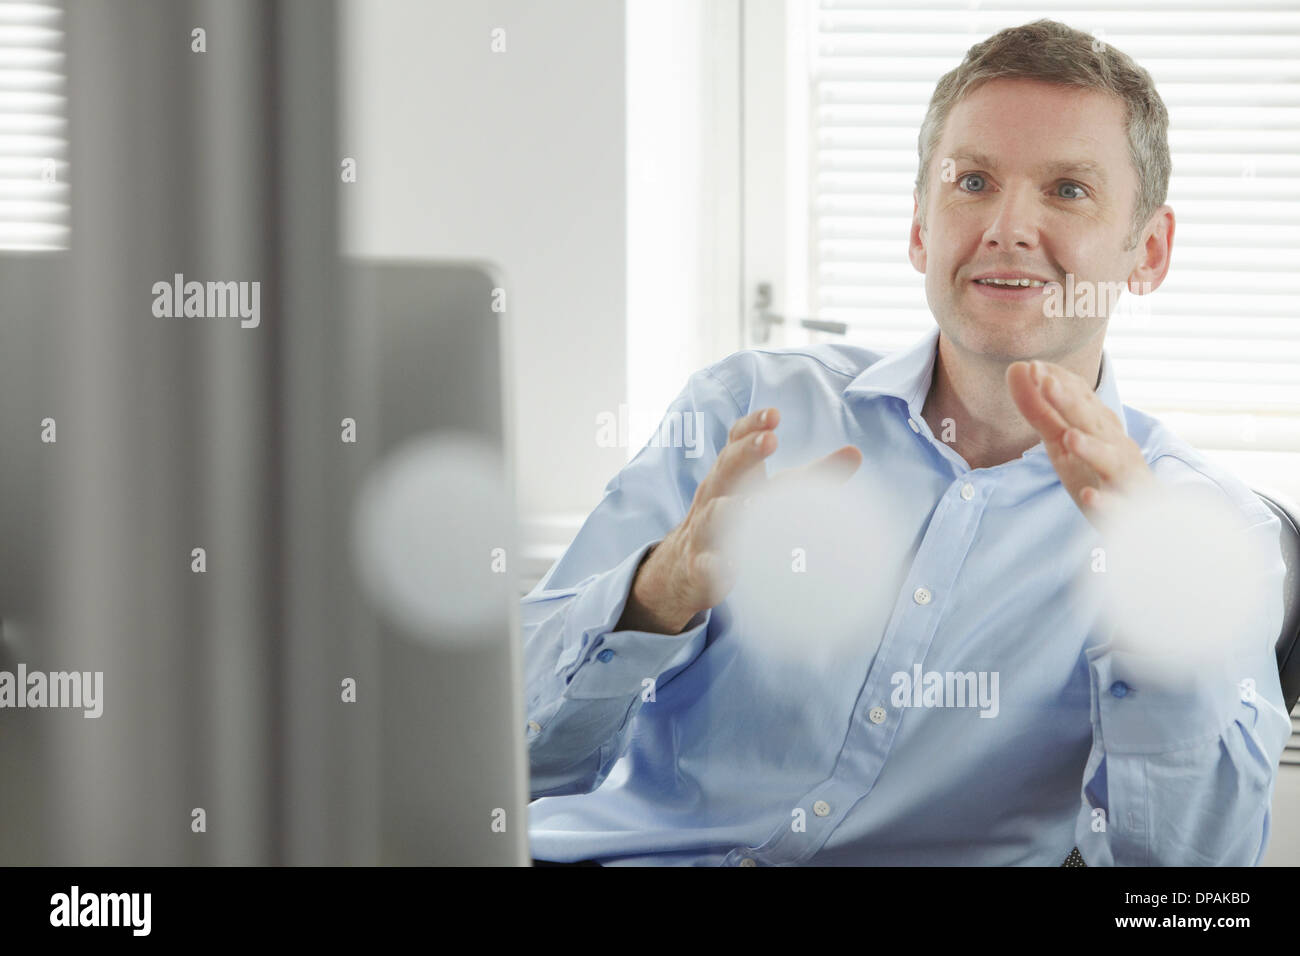 Mature businessman gesturing - Stock Image